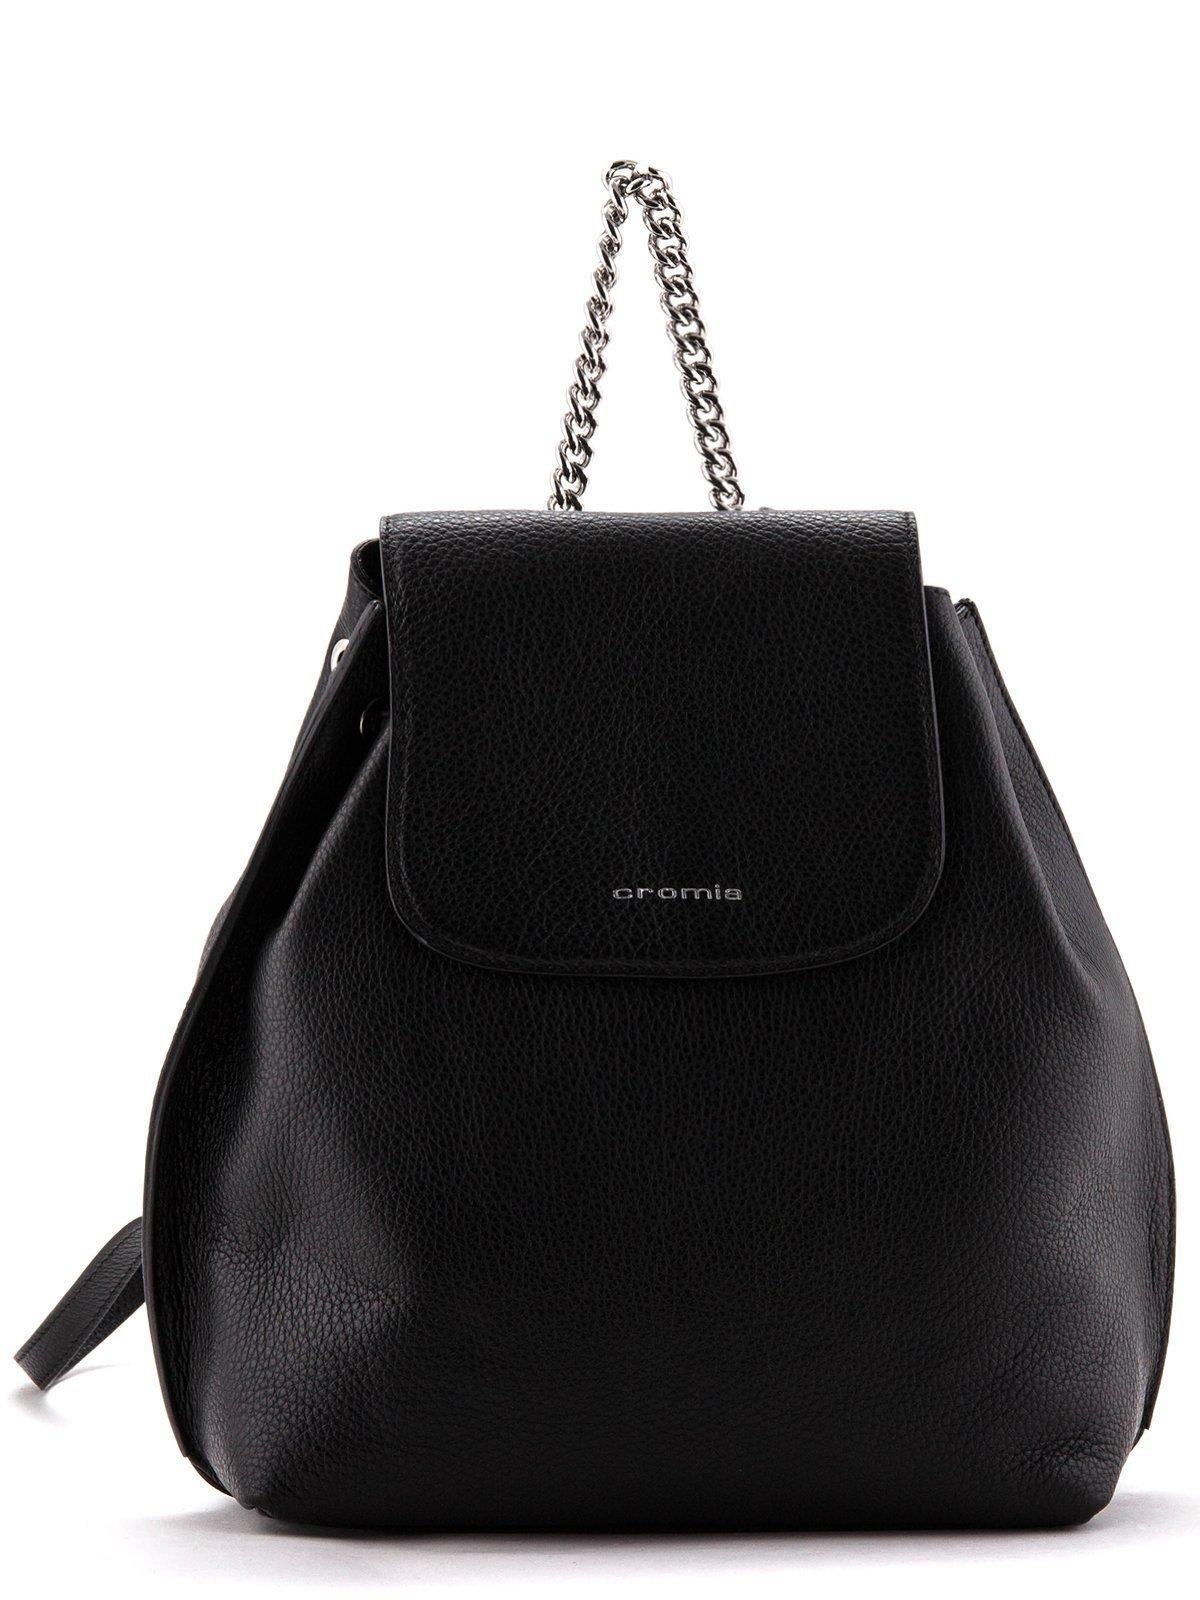 b8efb3e90548 Чёрный рюкзак Cromia купить по цене 16990 руб. ☛ (артикул ...